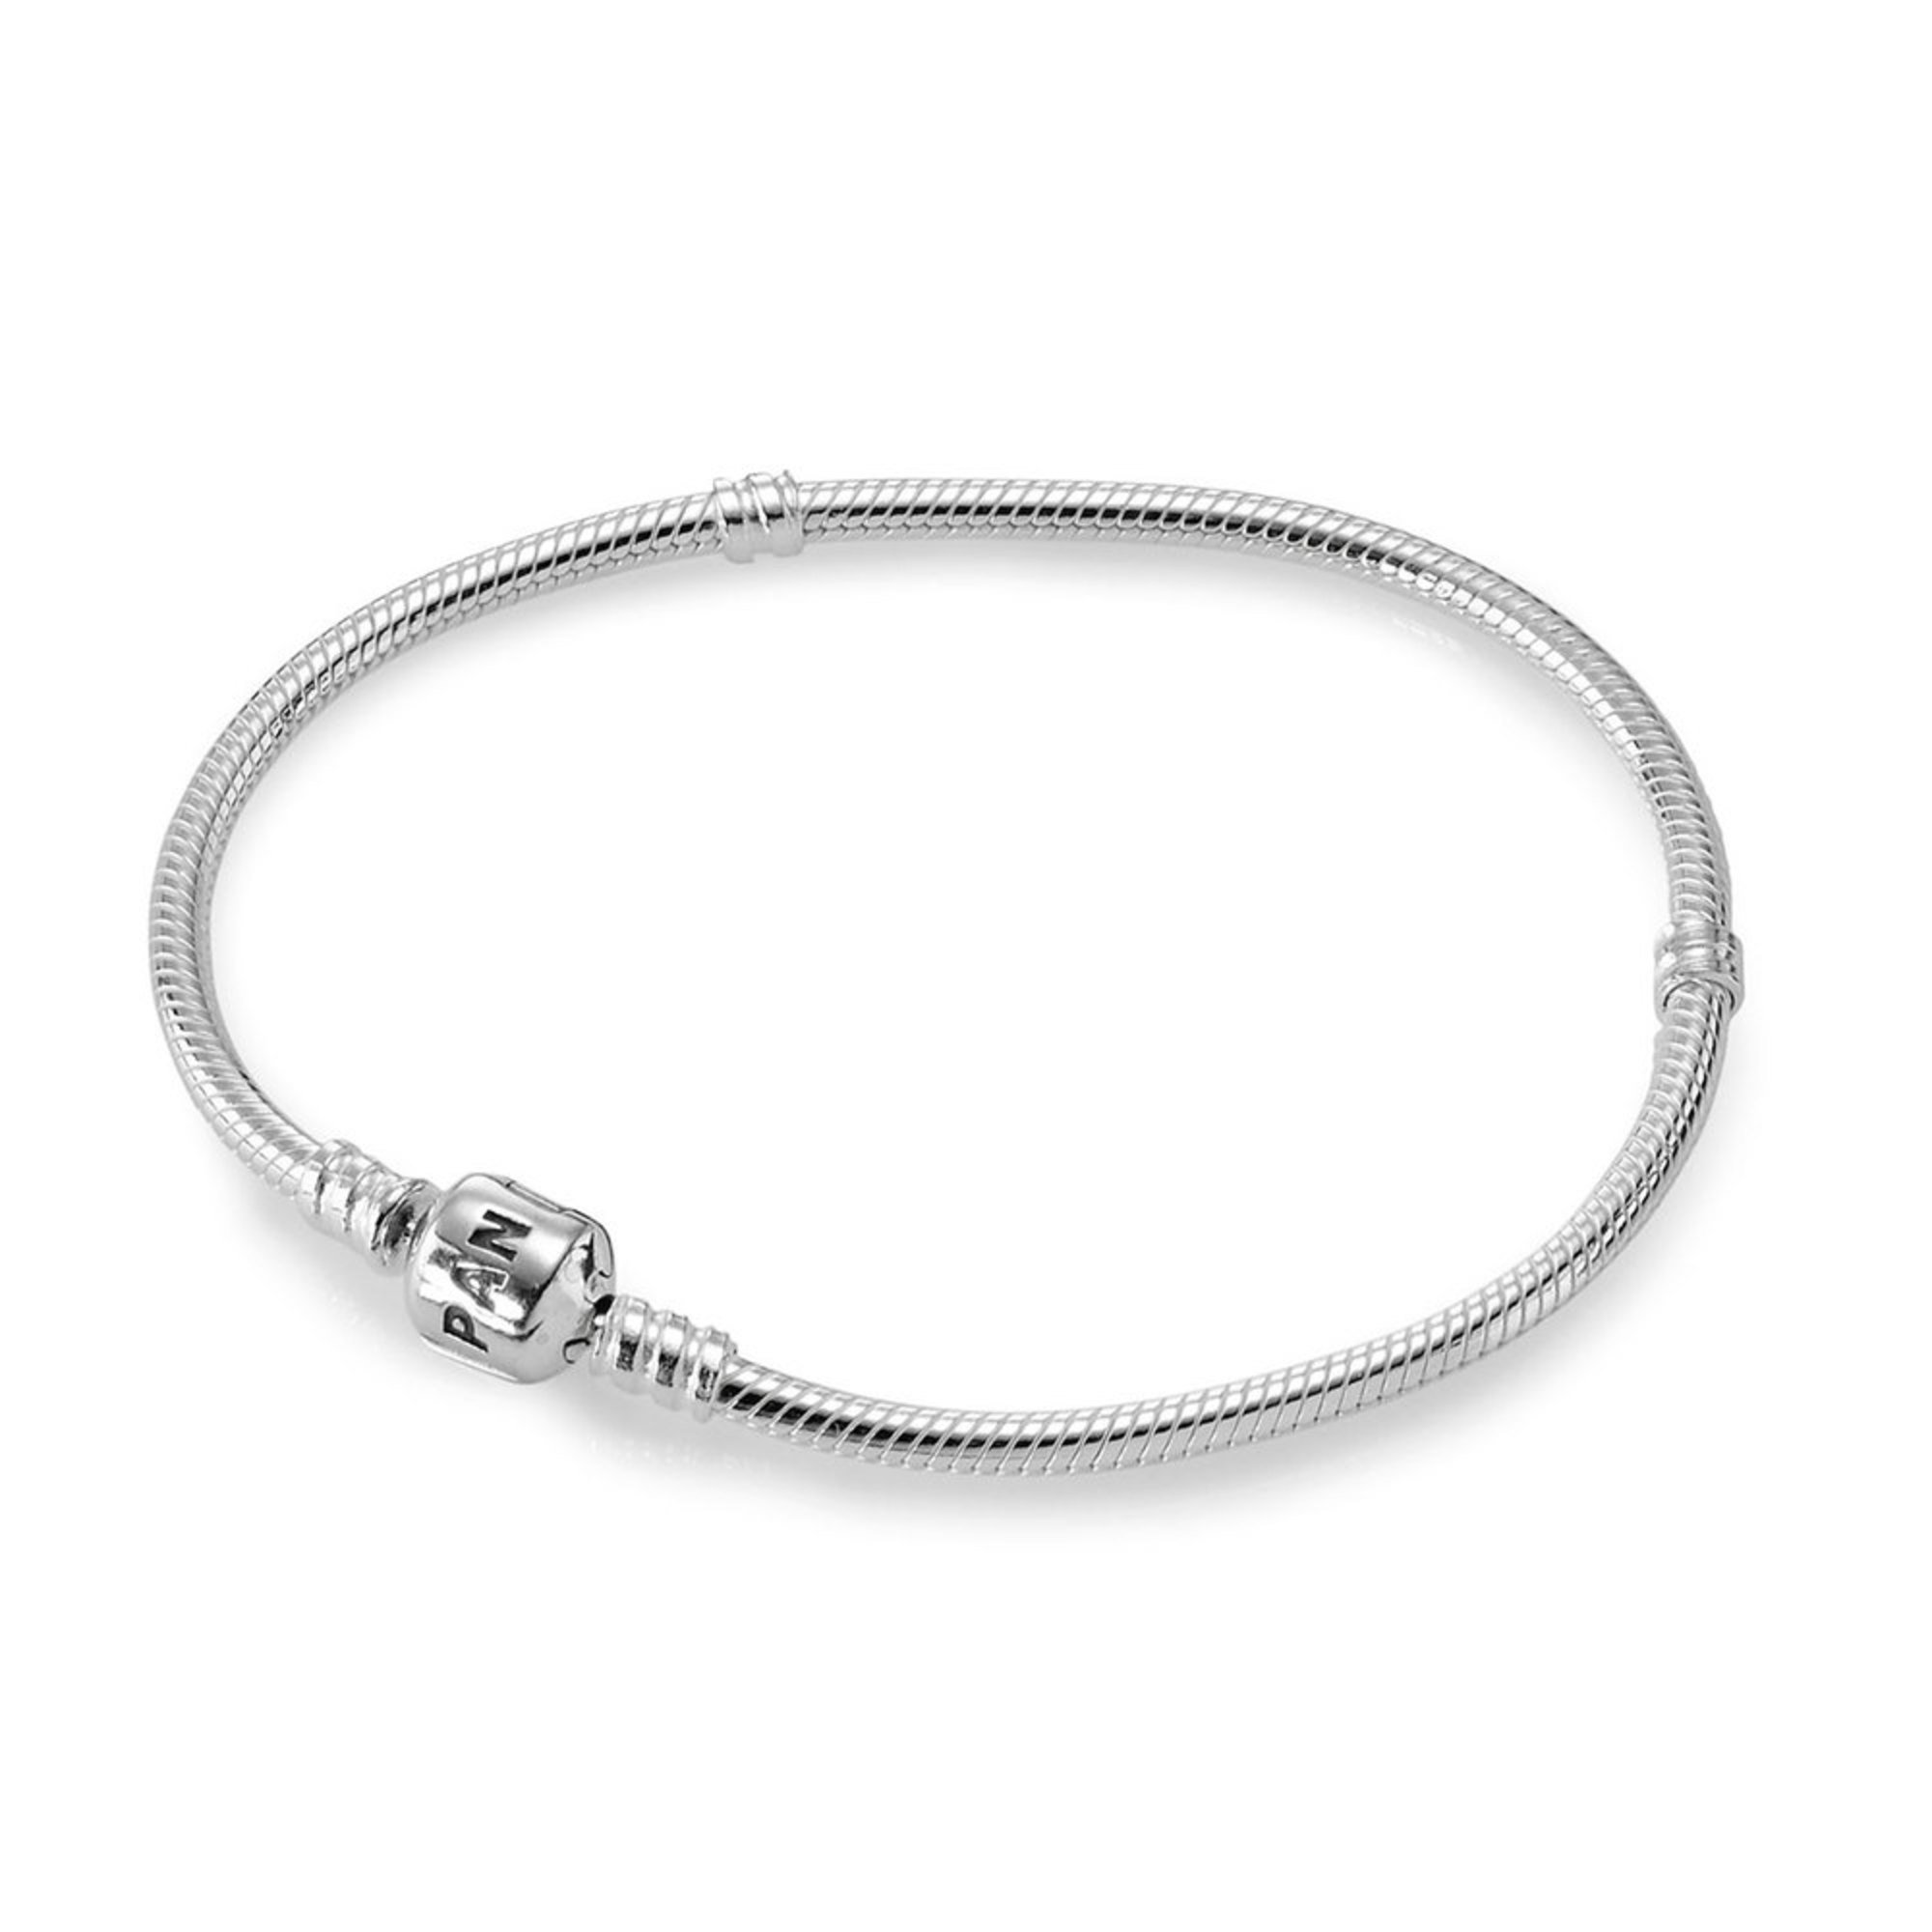 Pandora Iconic Silver Charm Bracelet Size